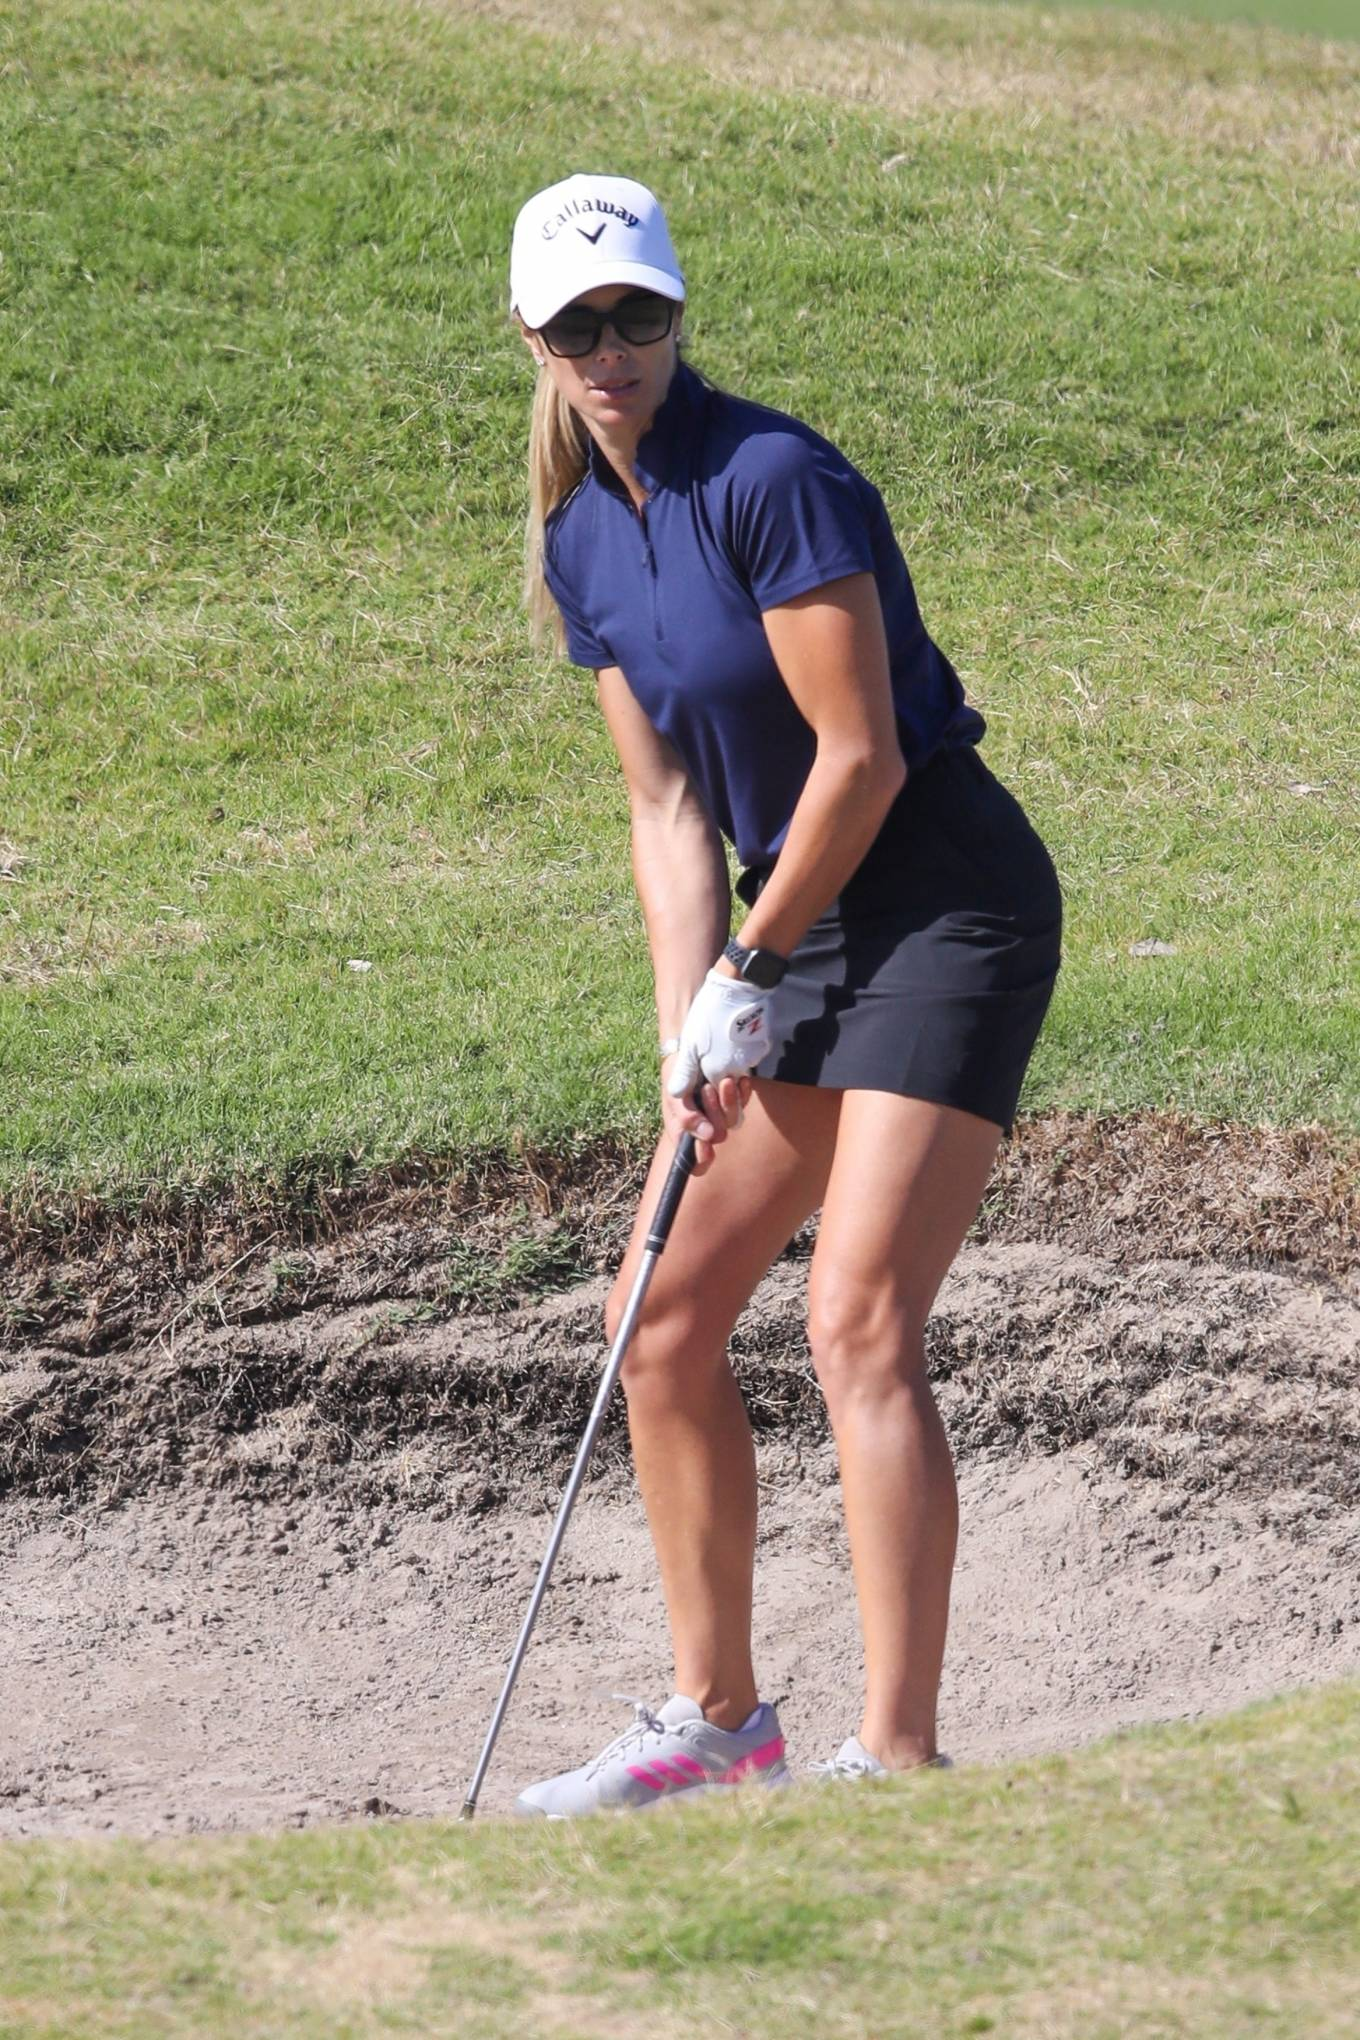 Candice Warner - Shows off her golf's skills in Sydney